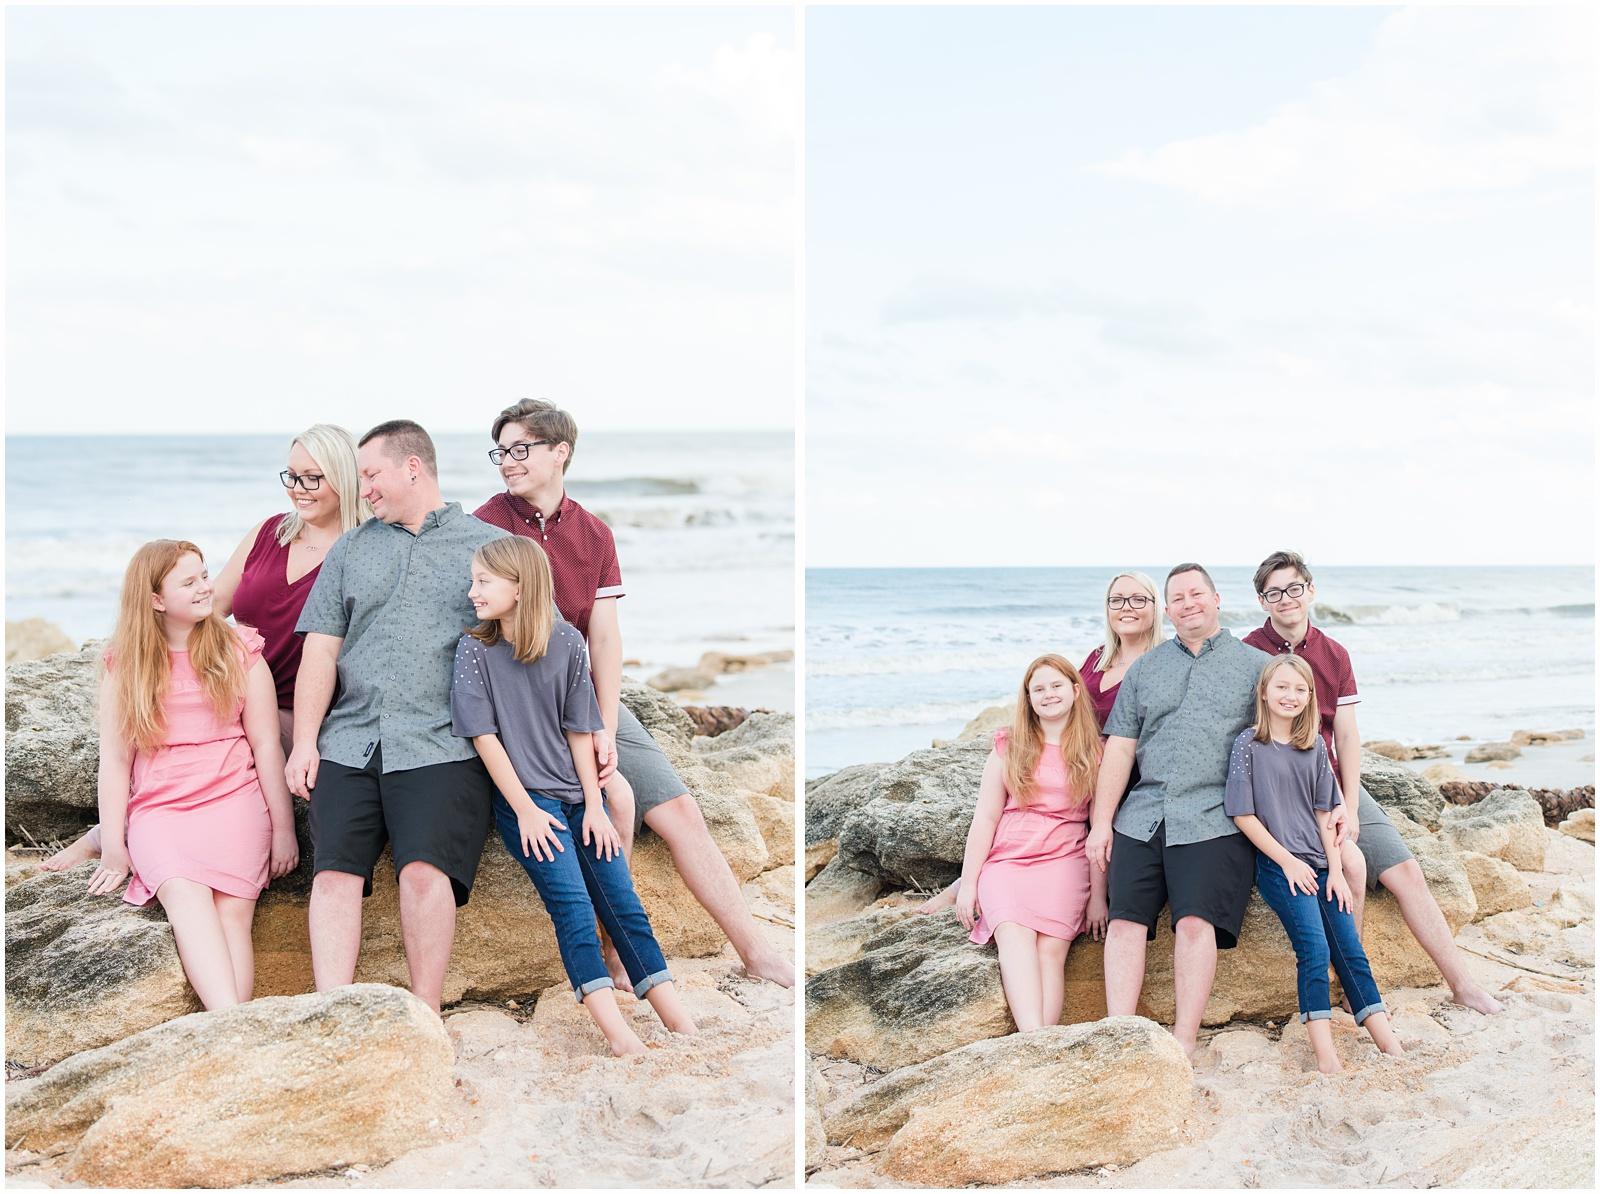 Washington Oaks_Garden_State Park_Beach_Family_Portraits_11.jpg